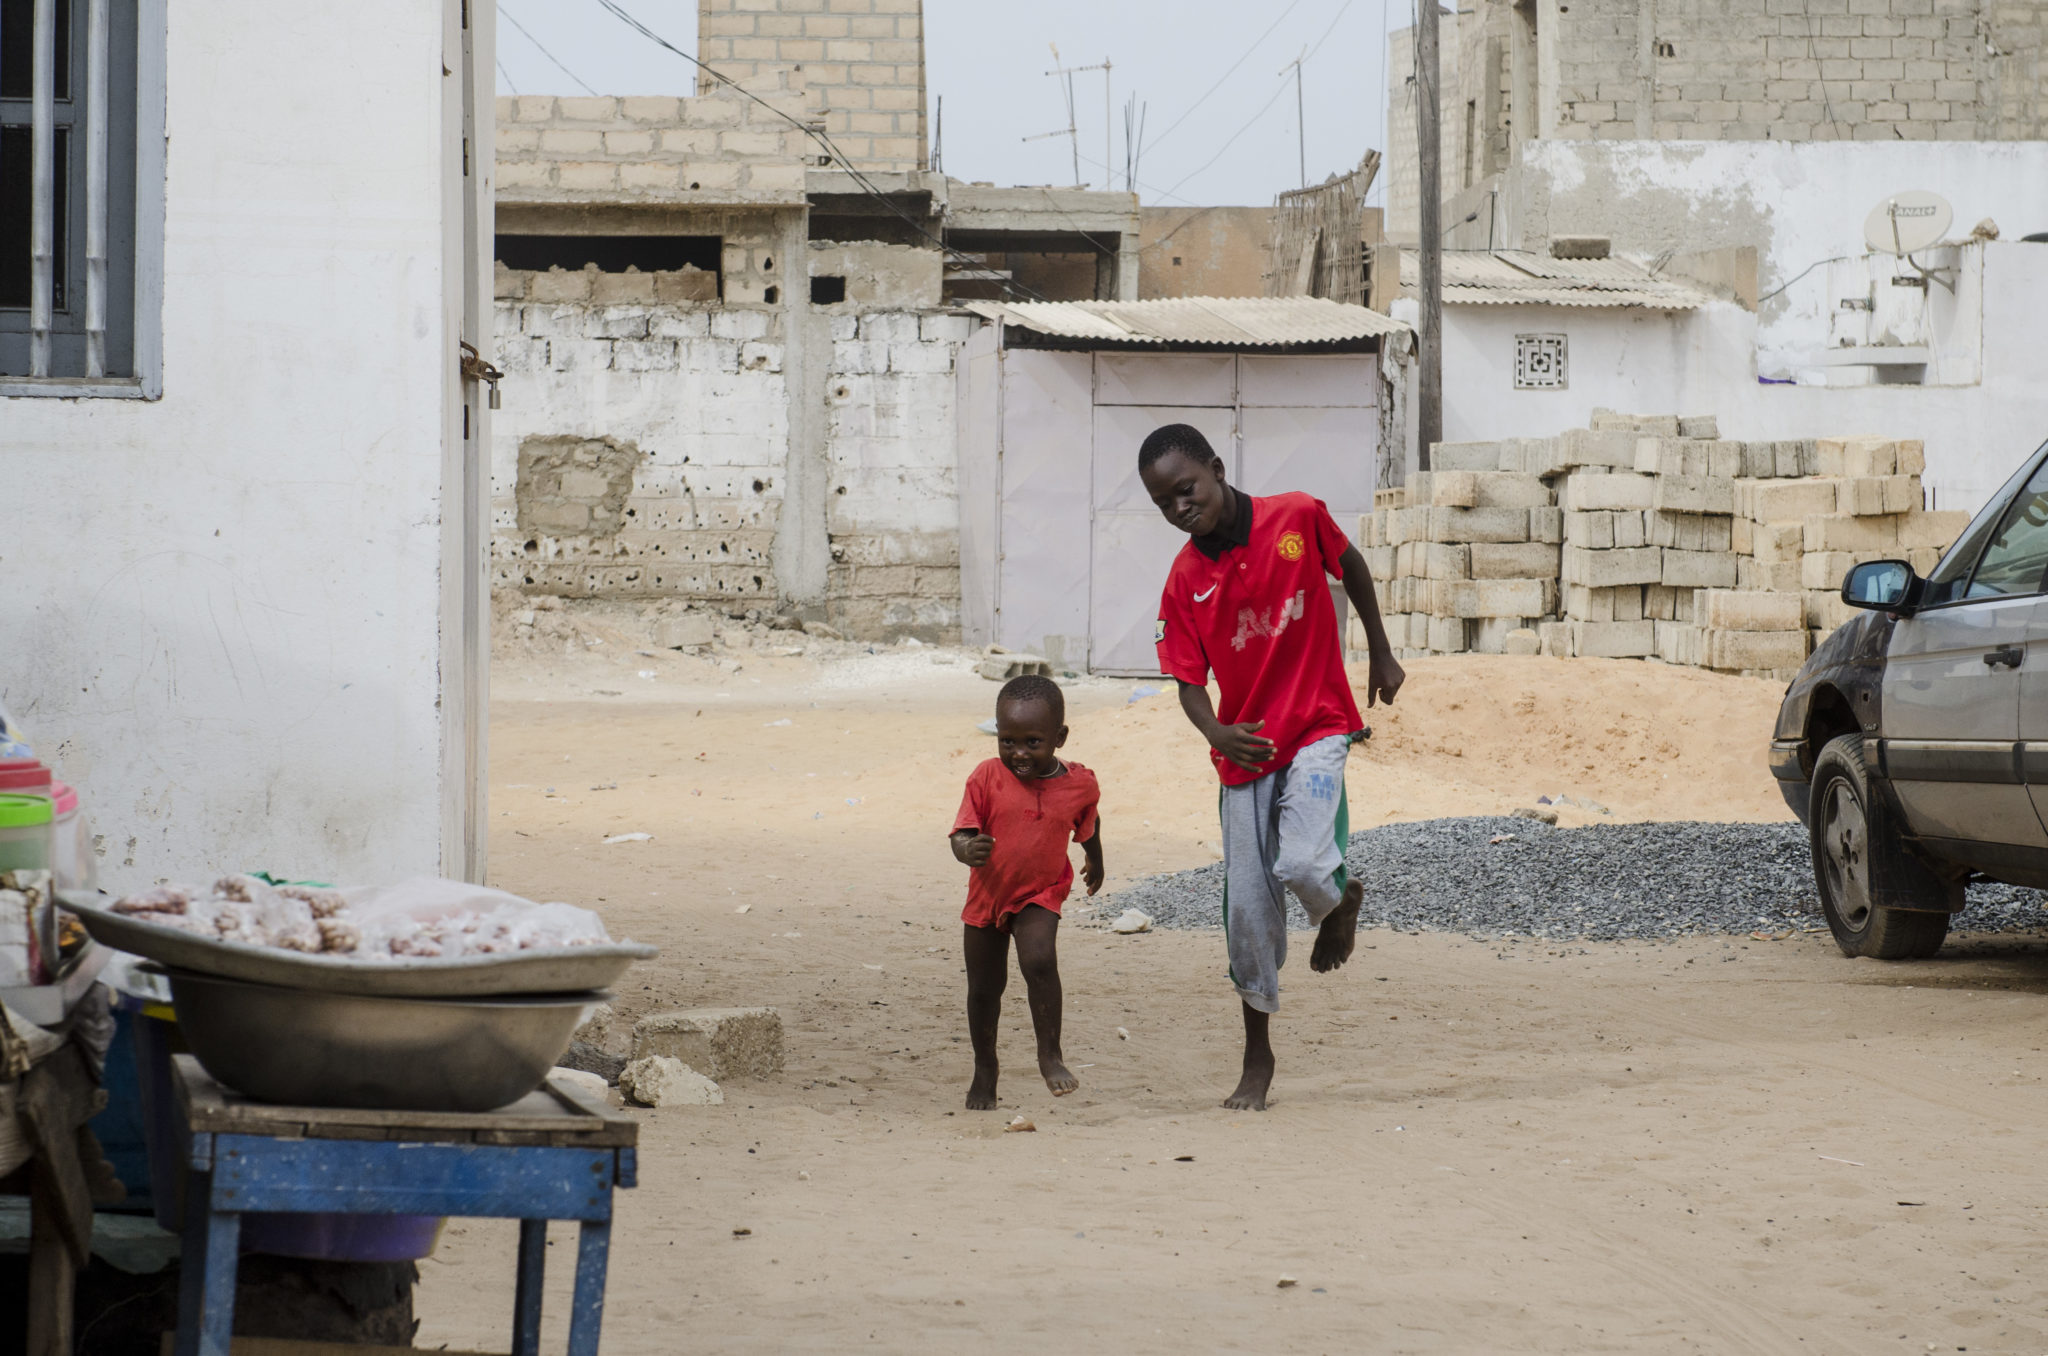 Mbour-Petite-Cote-Senegal-Kinder-Strasse